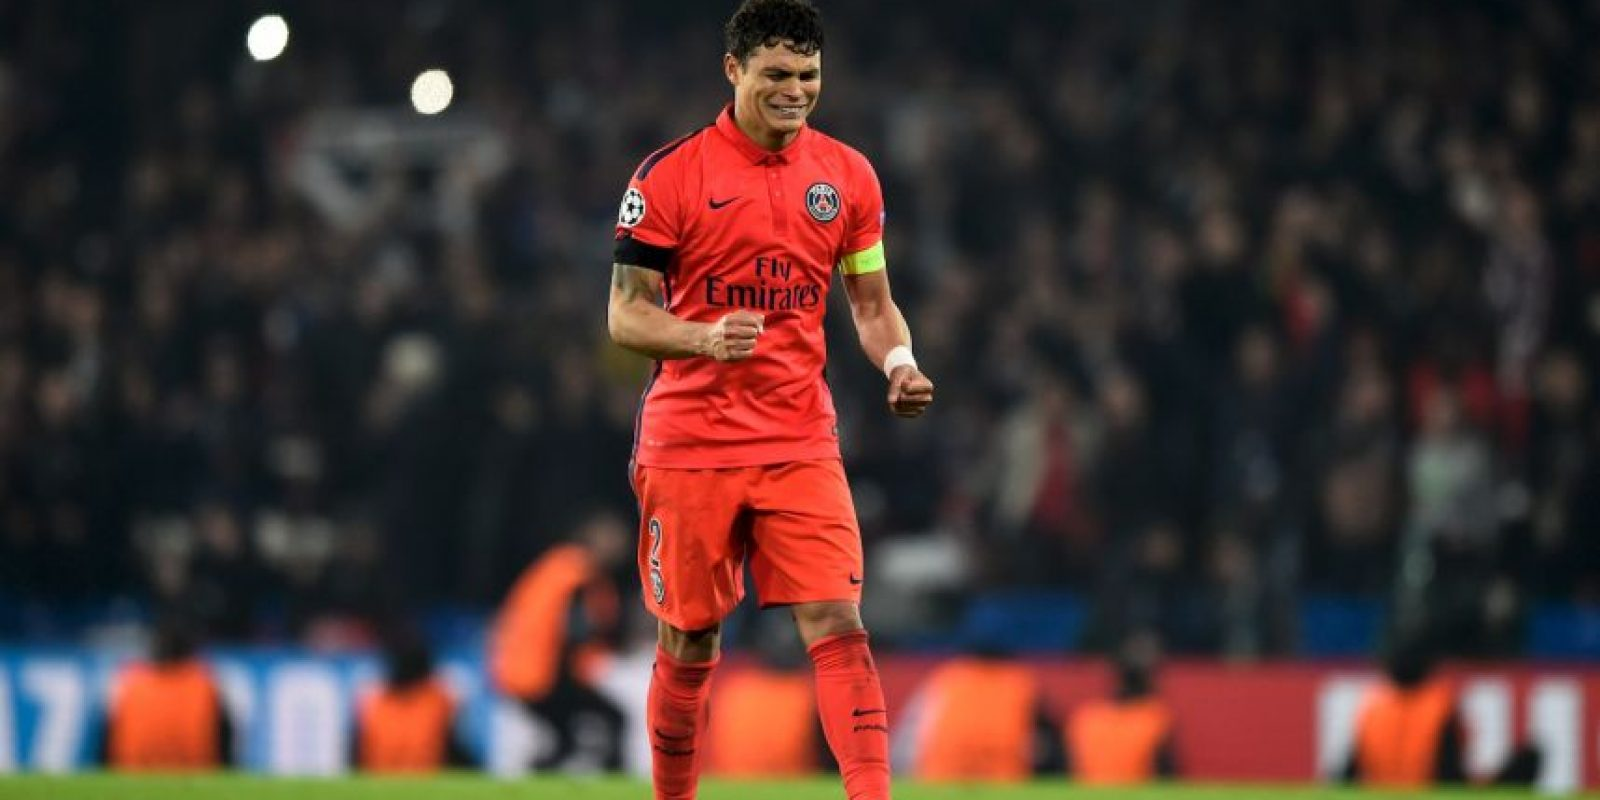 4. Thiago Silva Foto:Getty Images